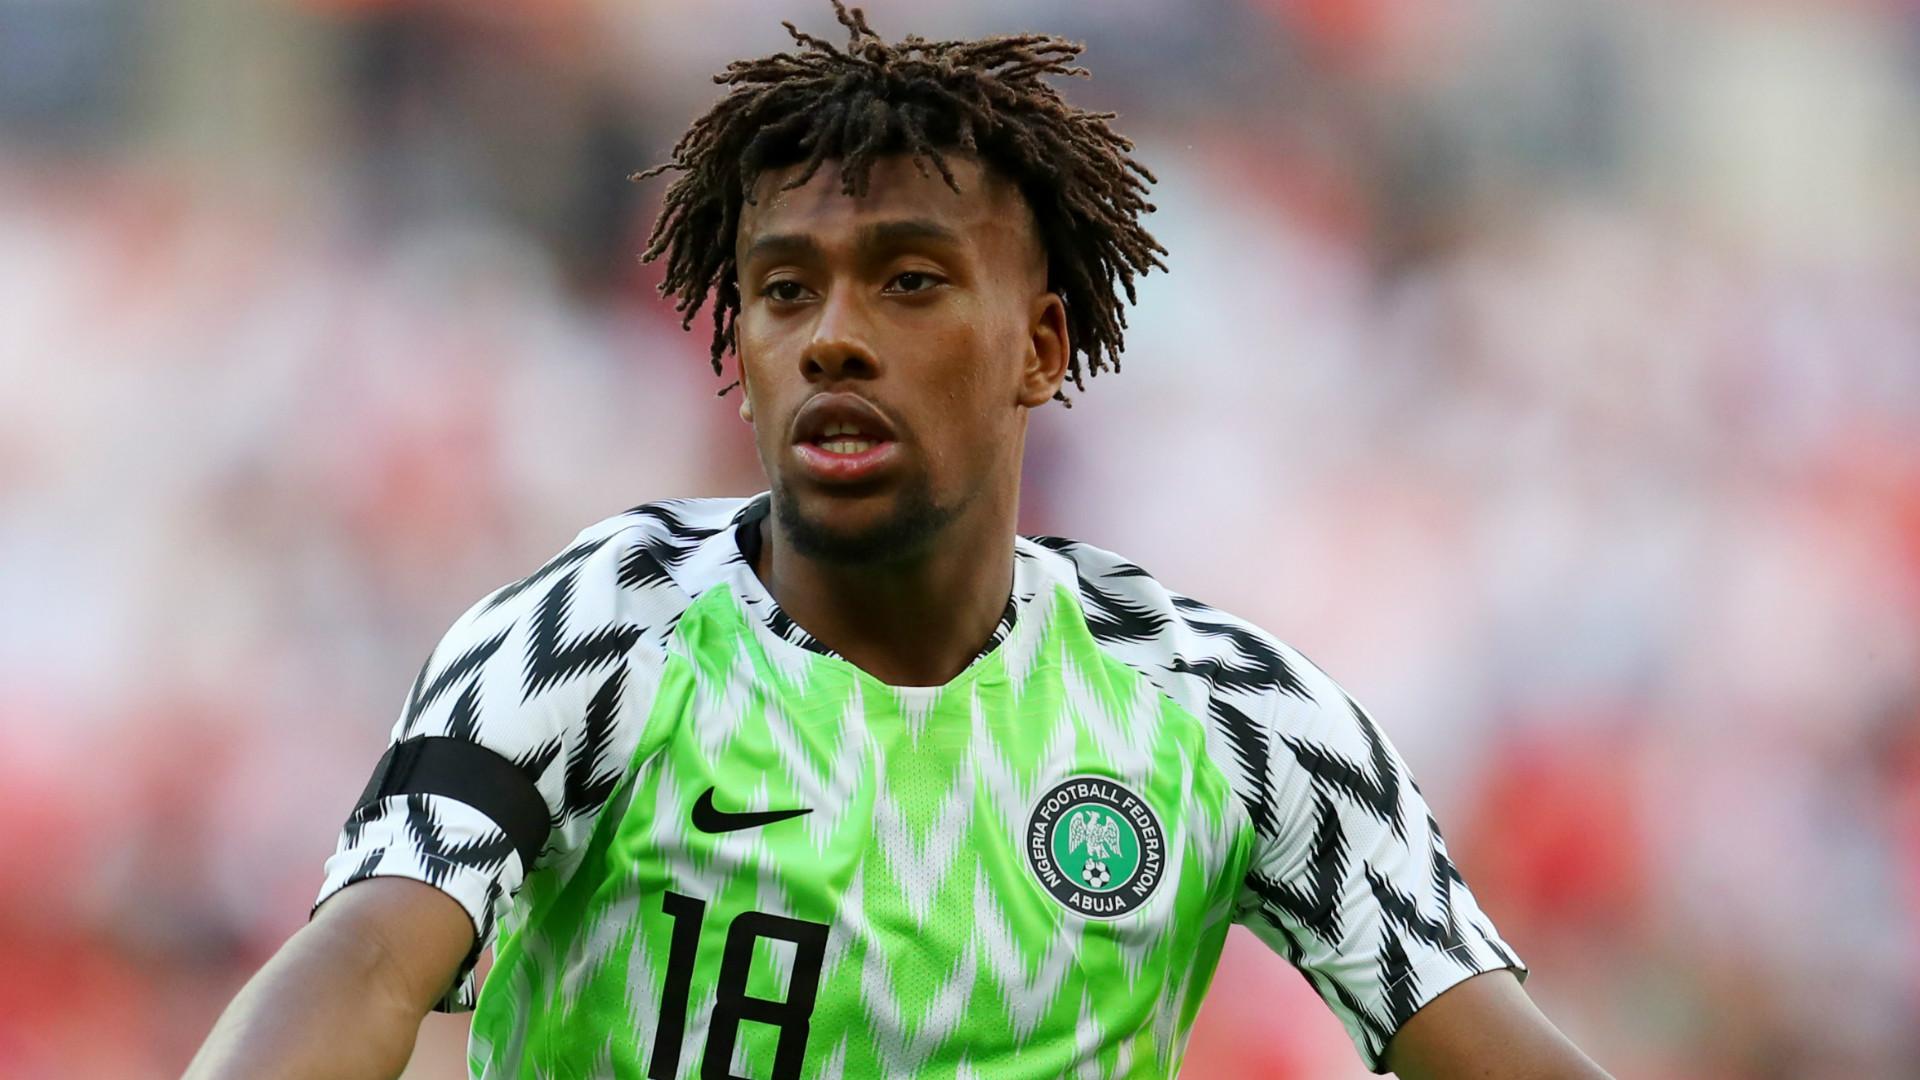 Arsenal news: 'Alex Iwobi is a star' - Kanu calls on fellow Nigerian to  believe in himself   Goal.com